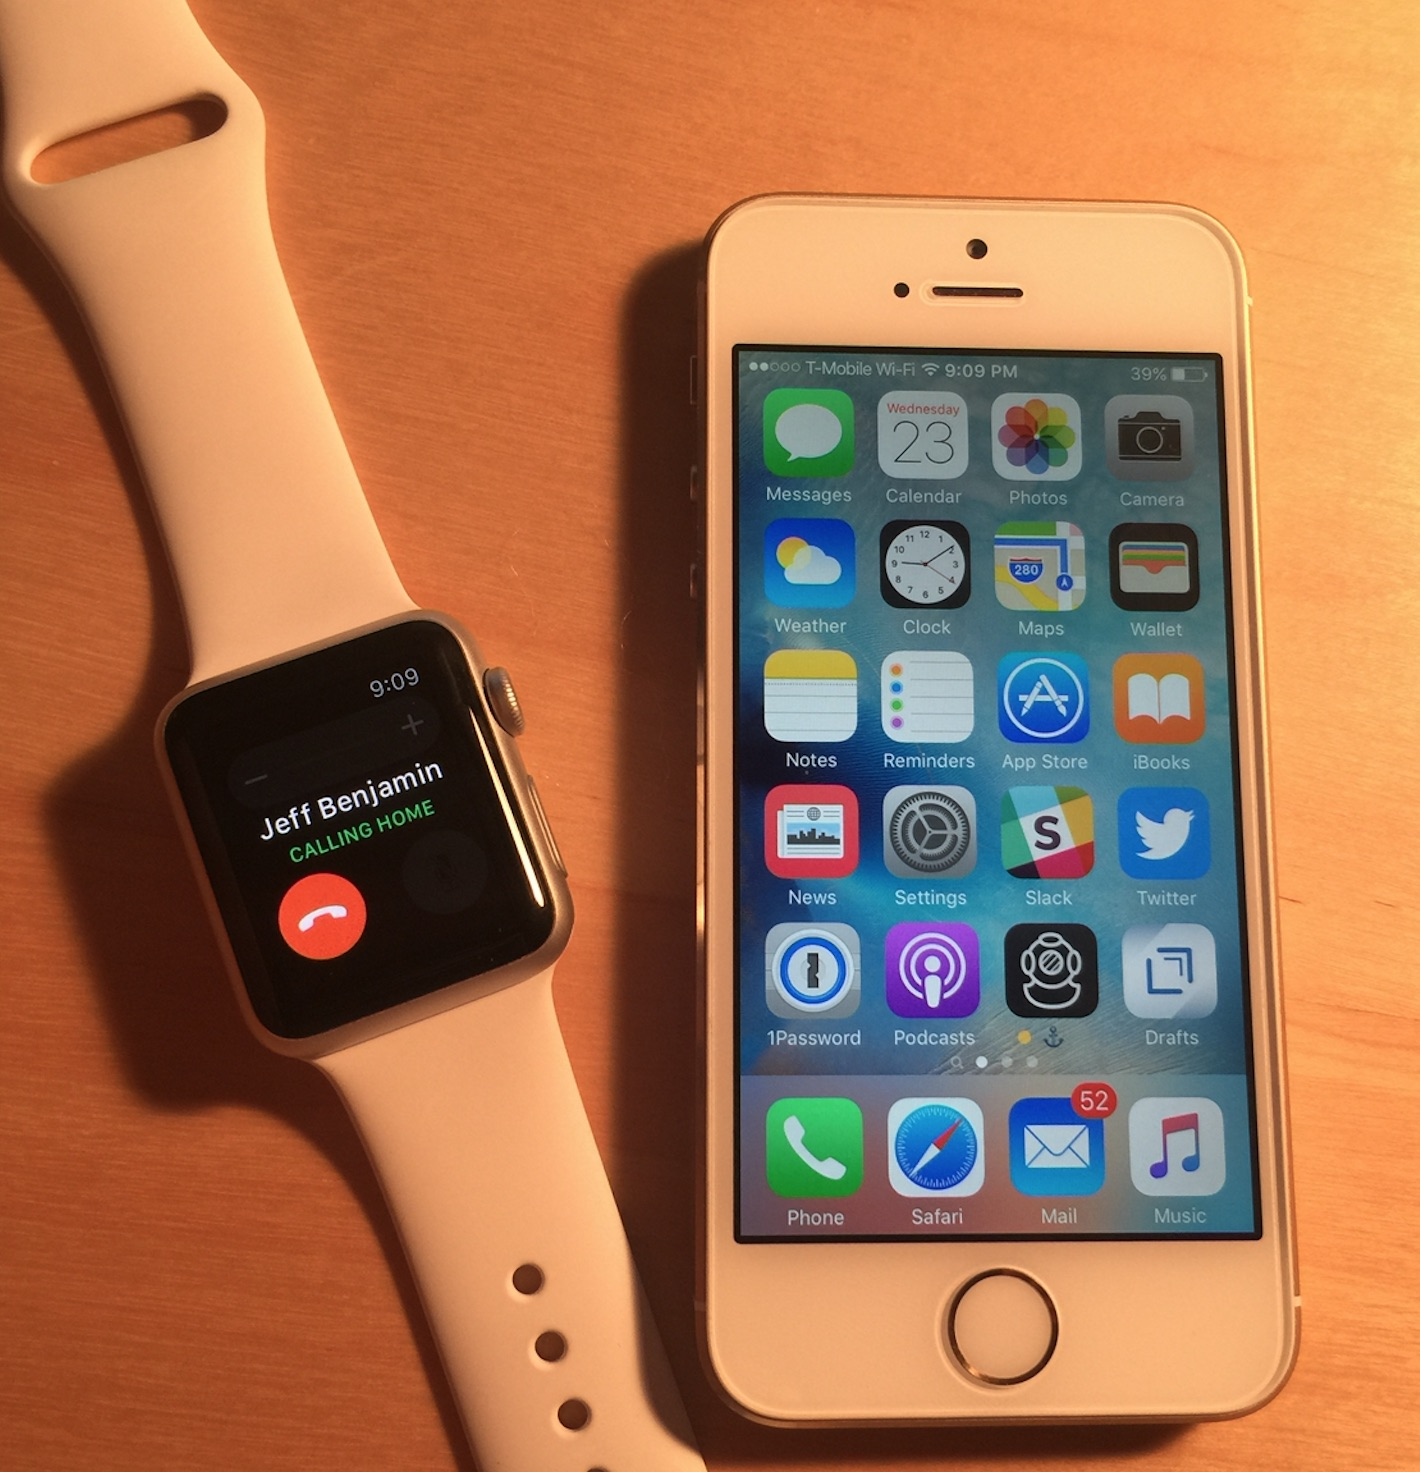 Wi-Fi call watchOS 2 no Bluetooth